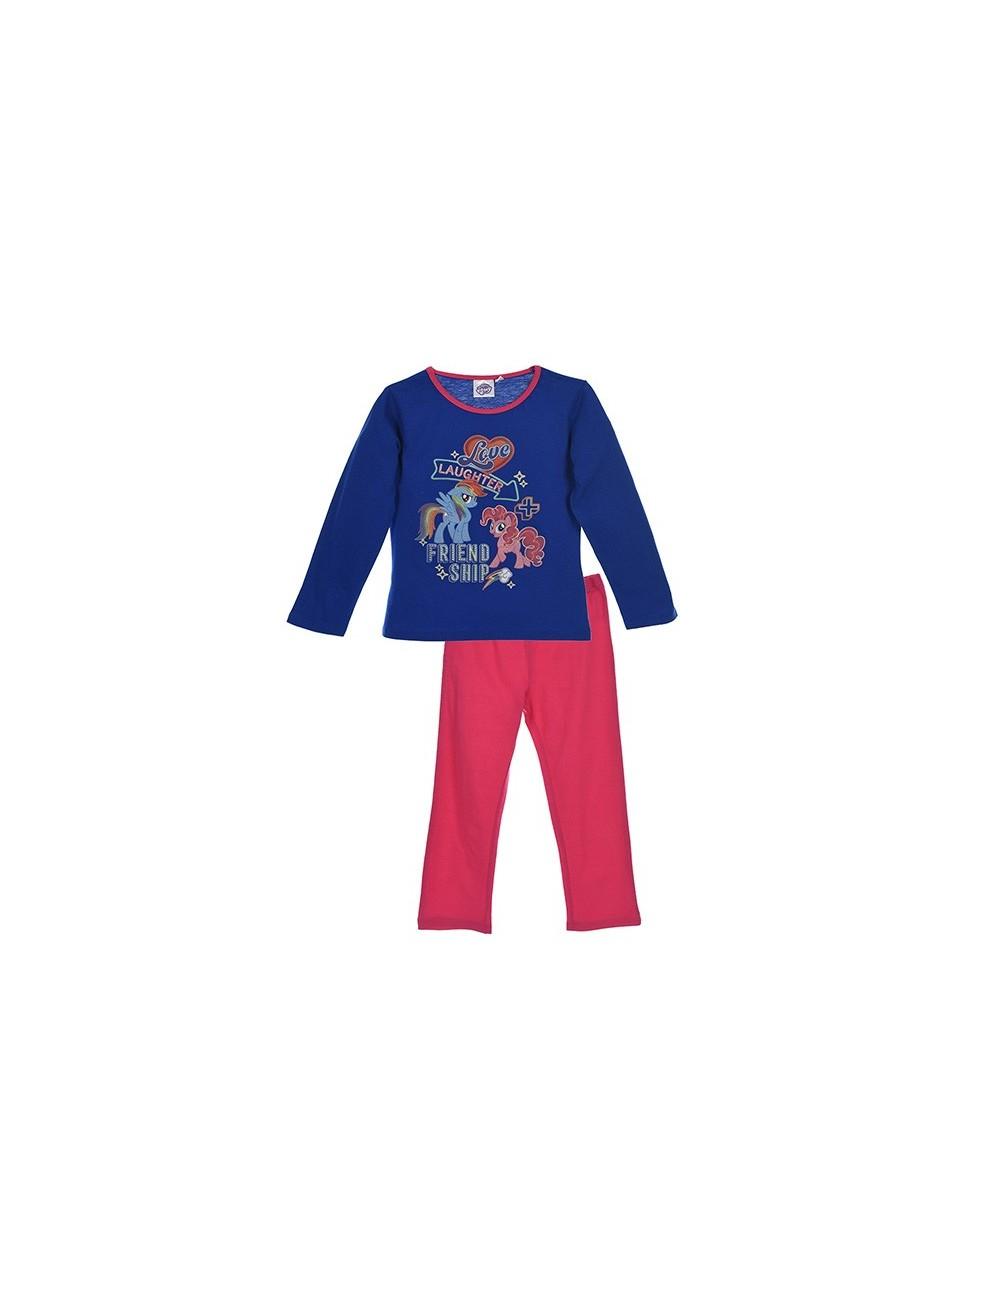 Pijama Micii Ponei, albastru-fucsia, fete 3 - 8 ani